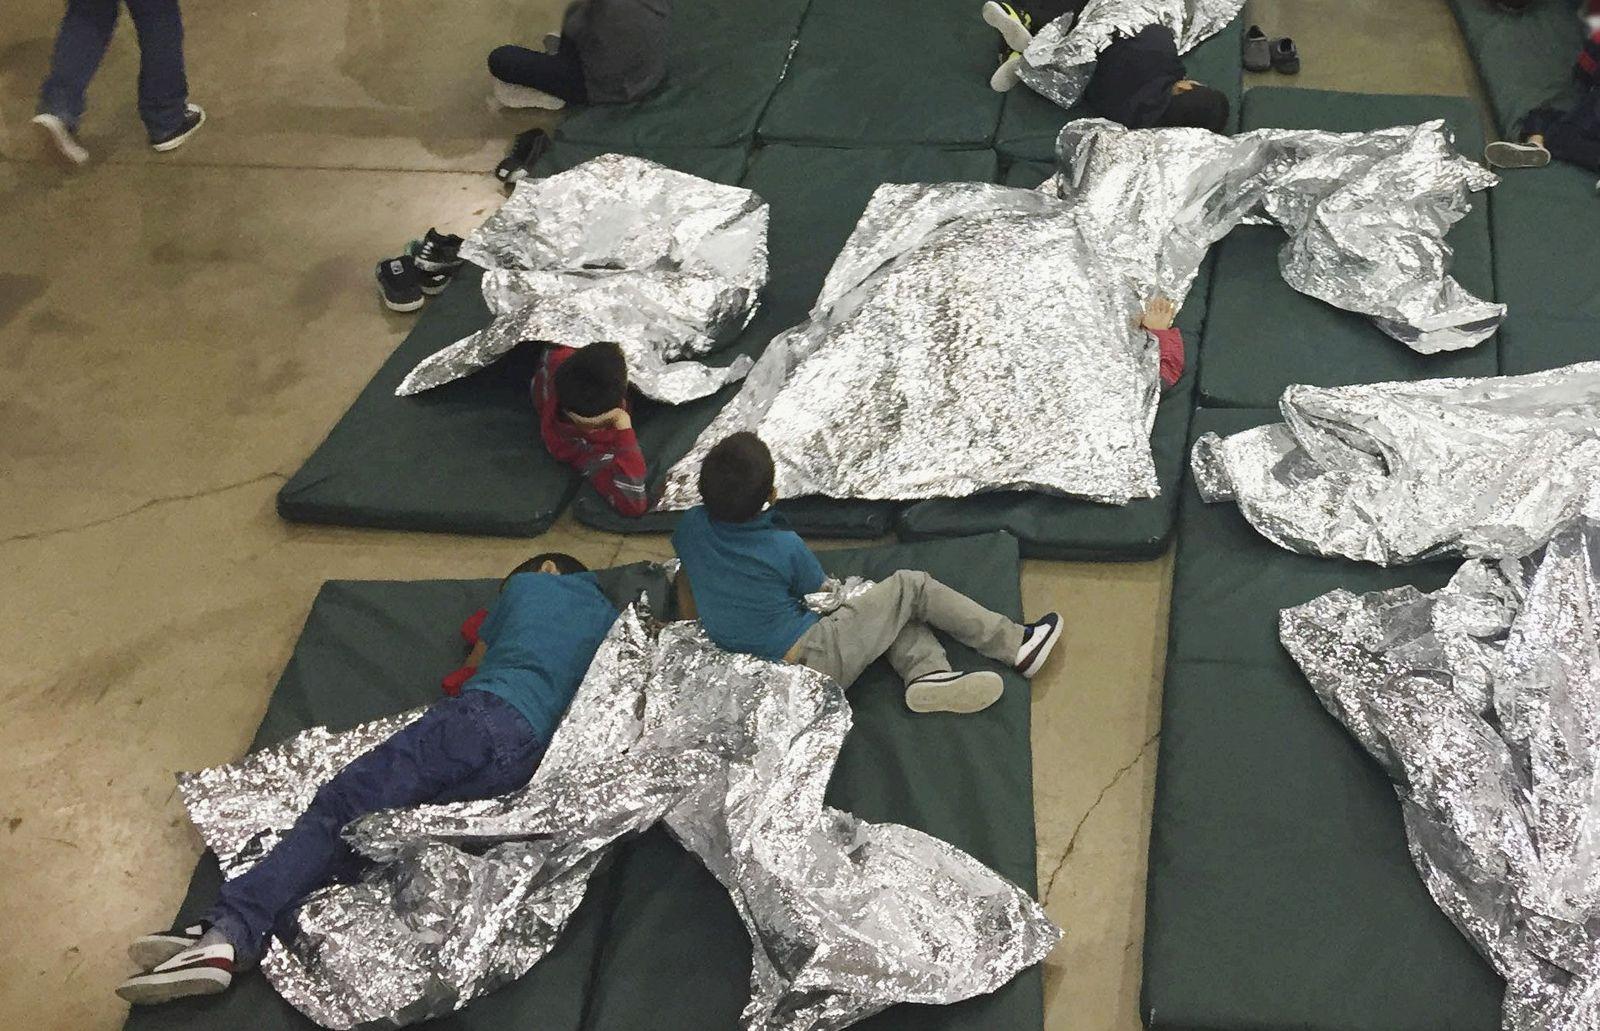 USA / US-Grenzschutzbehörde